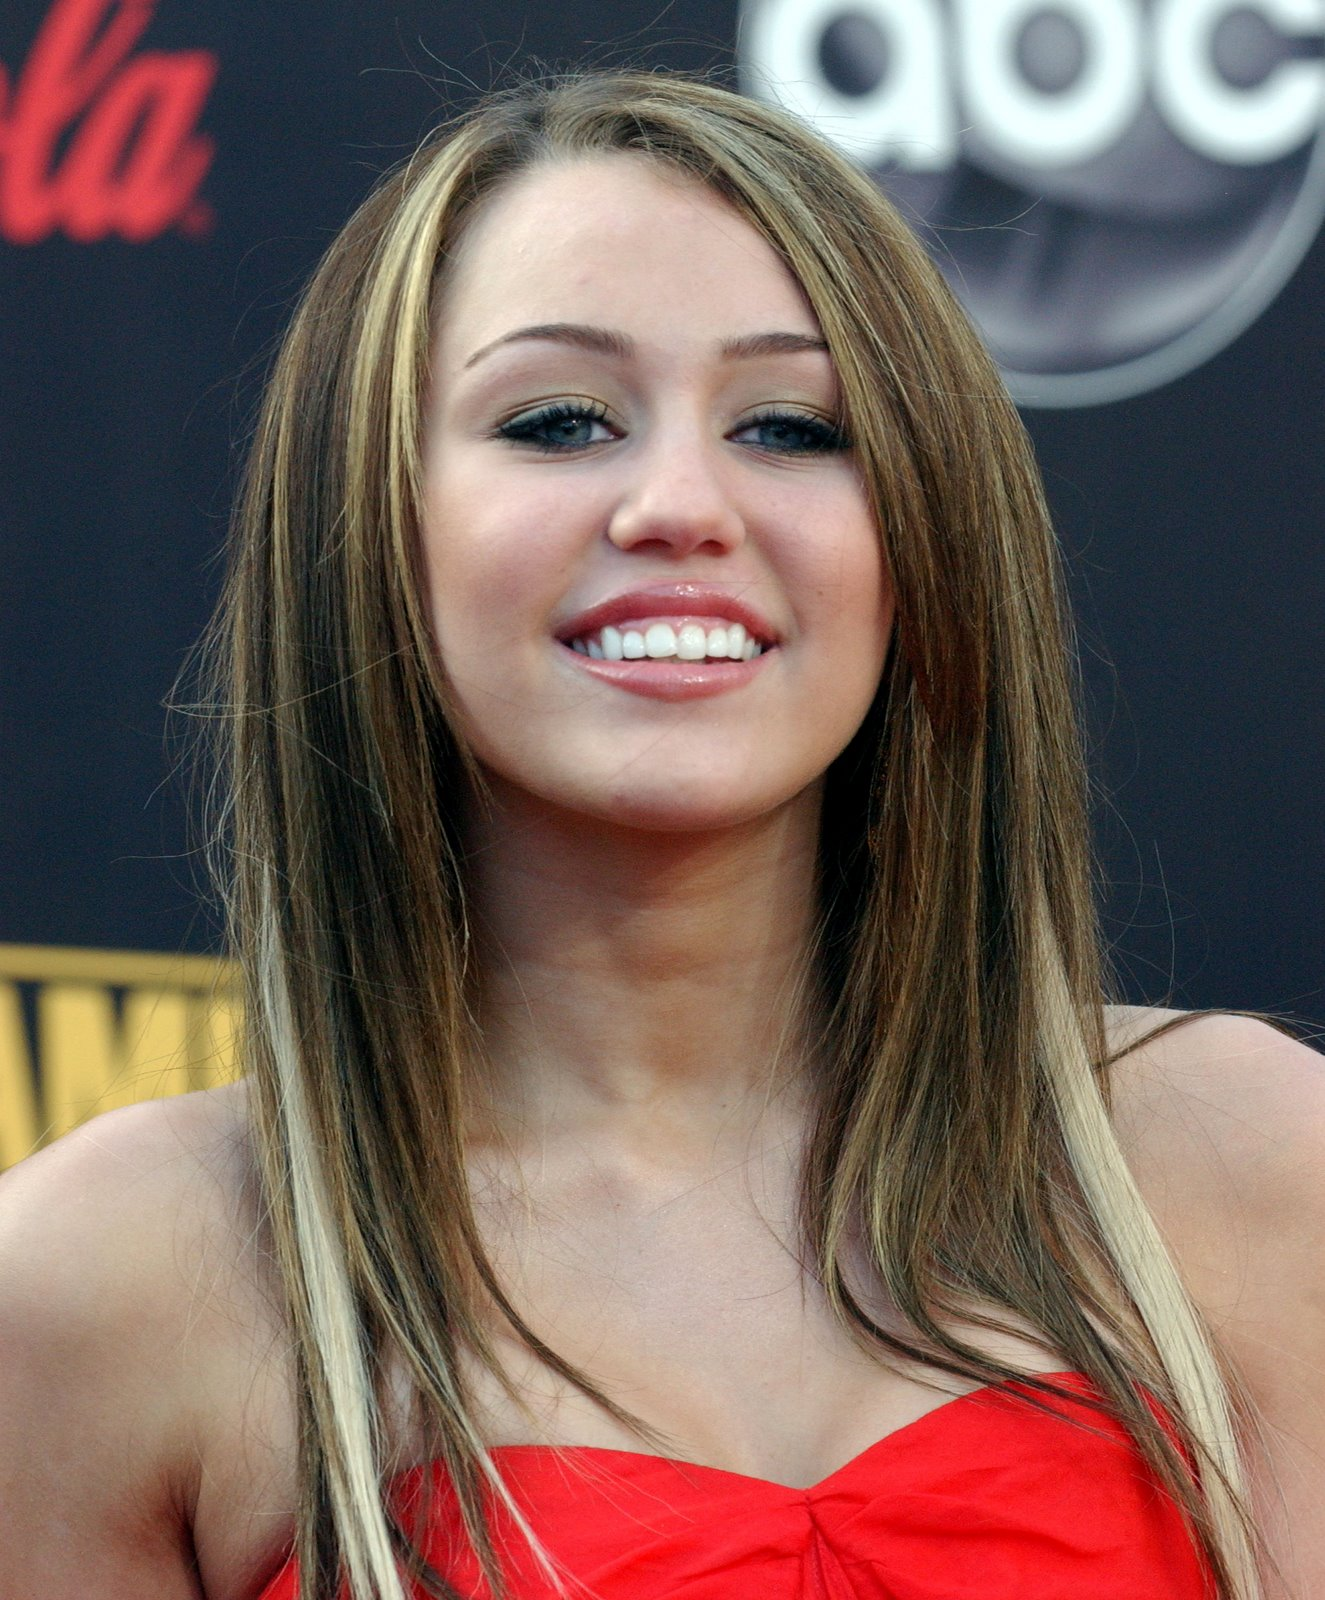 http://1.bp.blogspot.com/-4a38LtdUiX0/TY-HhkkvPqI/AAAAAAAABps/Qv4ZcQbgCUk/s1600/Miley%2BRay%2BCyrus%2B3.jpg